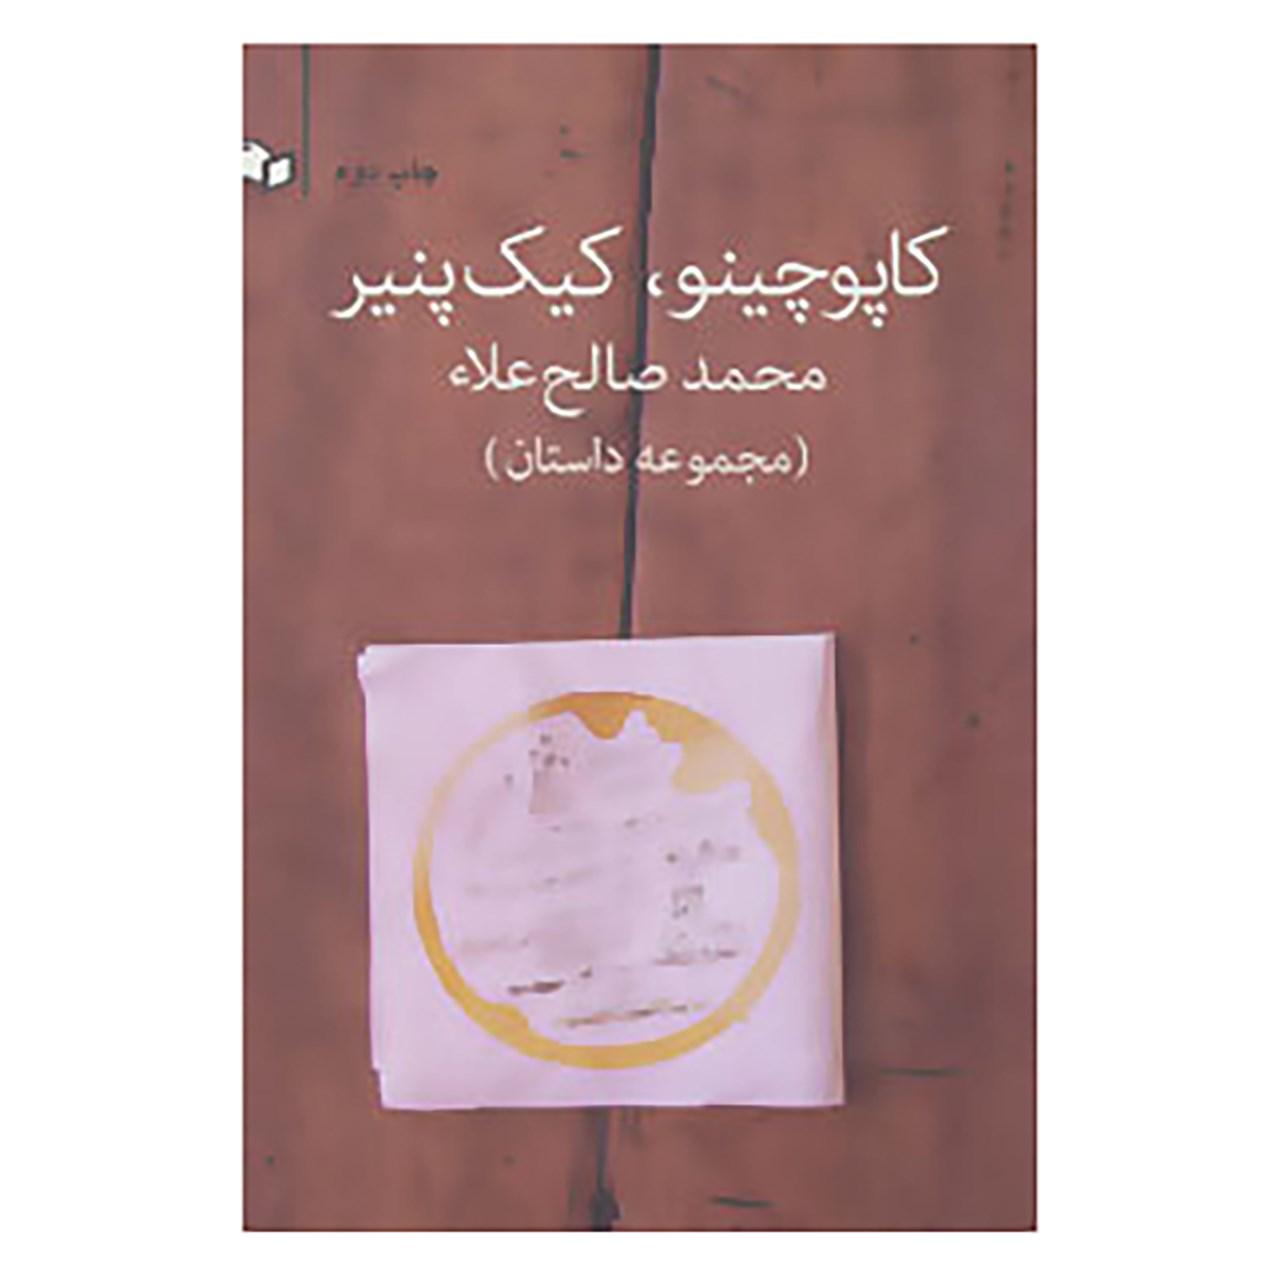 خرید                      کتاب کاپوچینو،کیک پنیر اثر محمد صالح علا